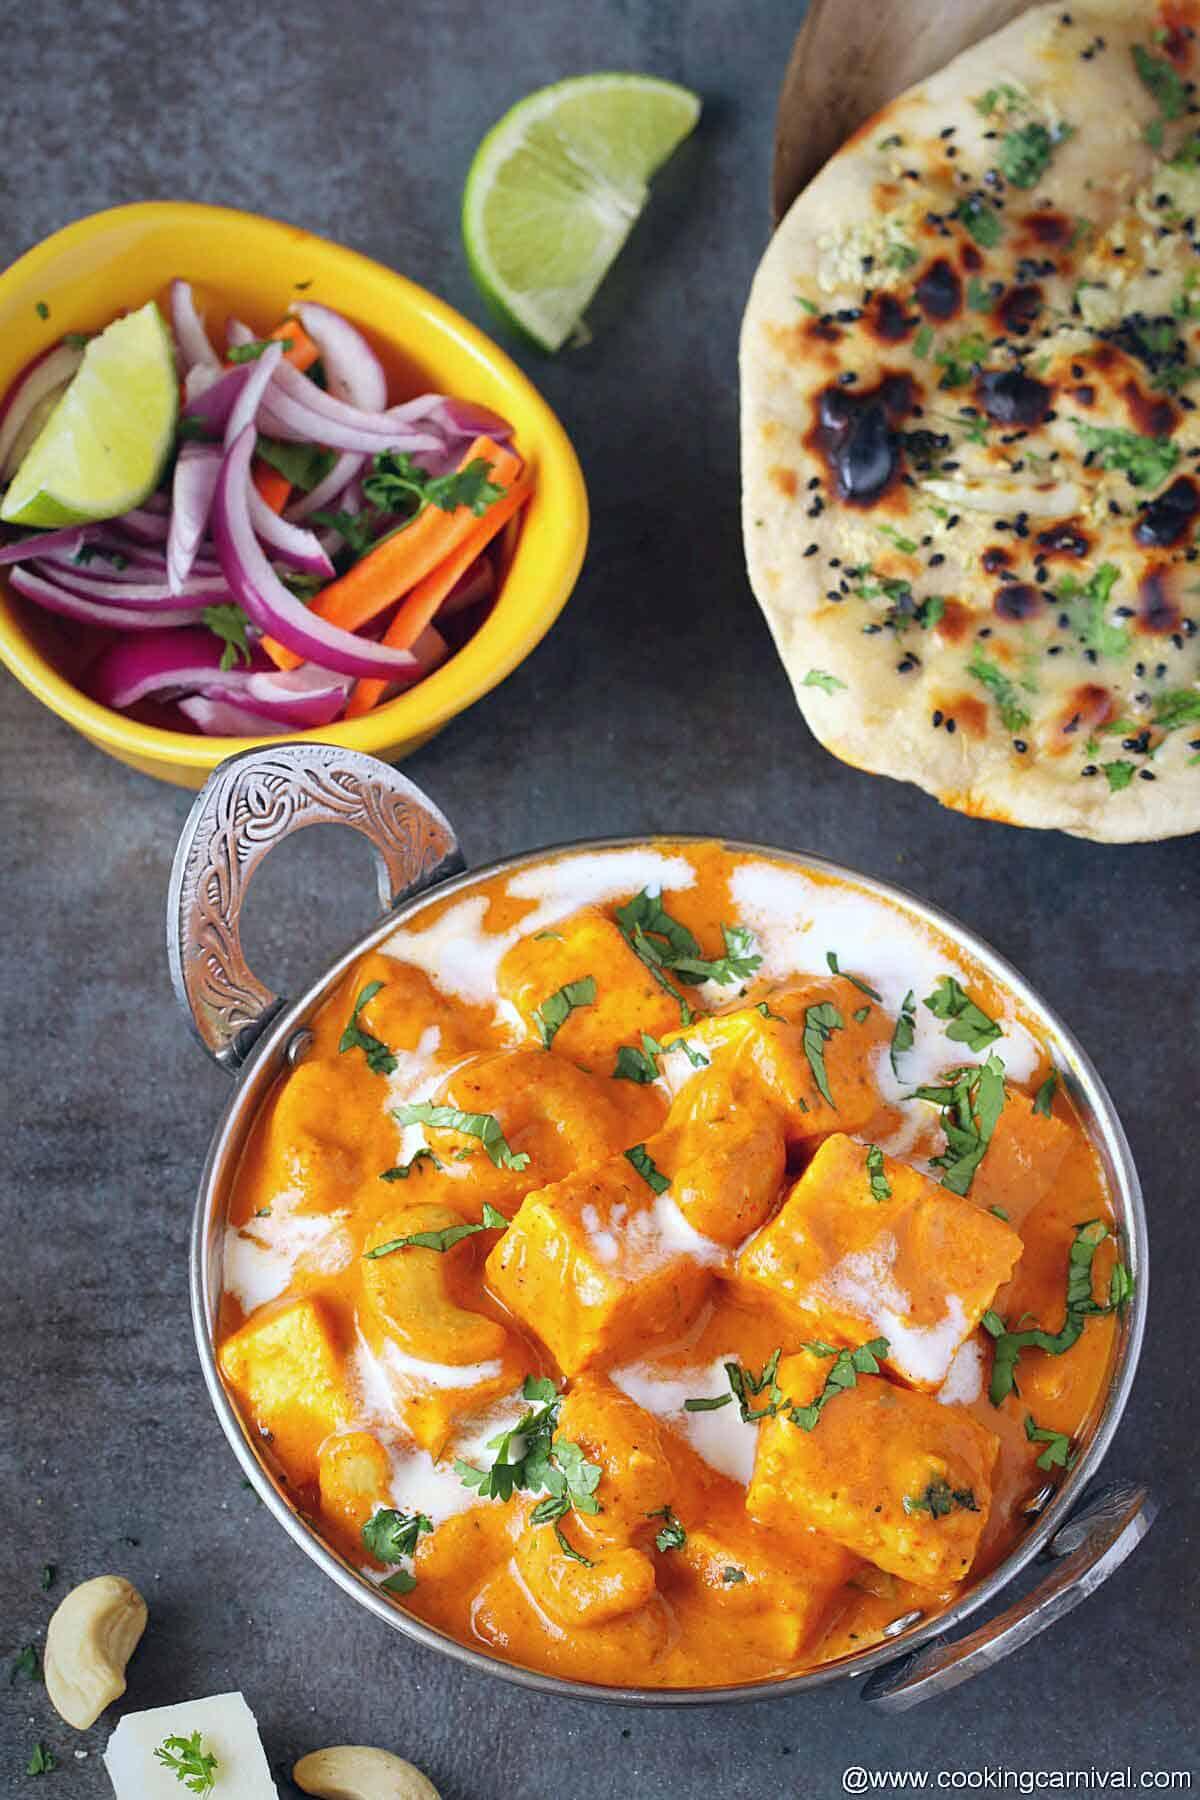 Final dish shot of paneer curry, tandoori roti and onion salad on the side